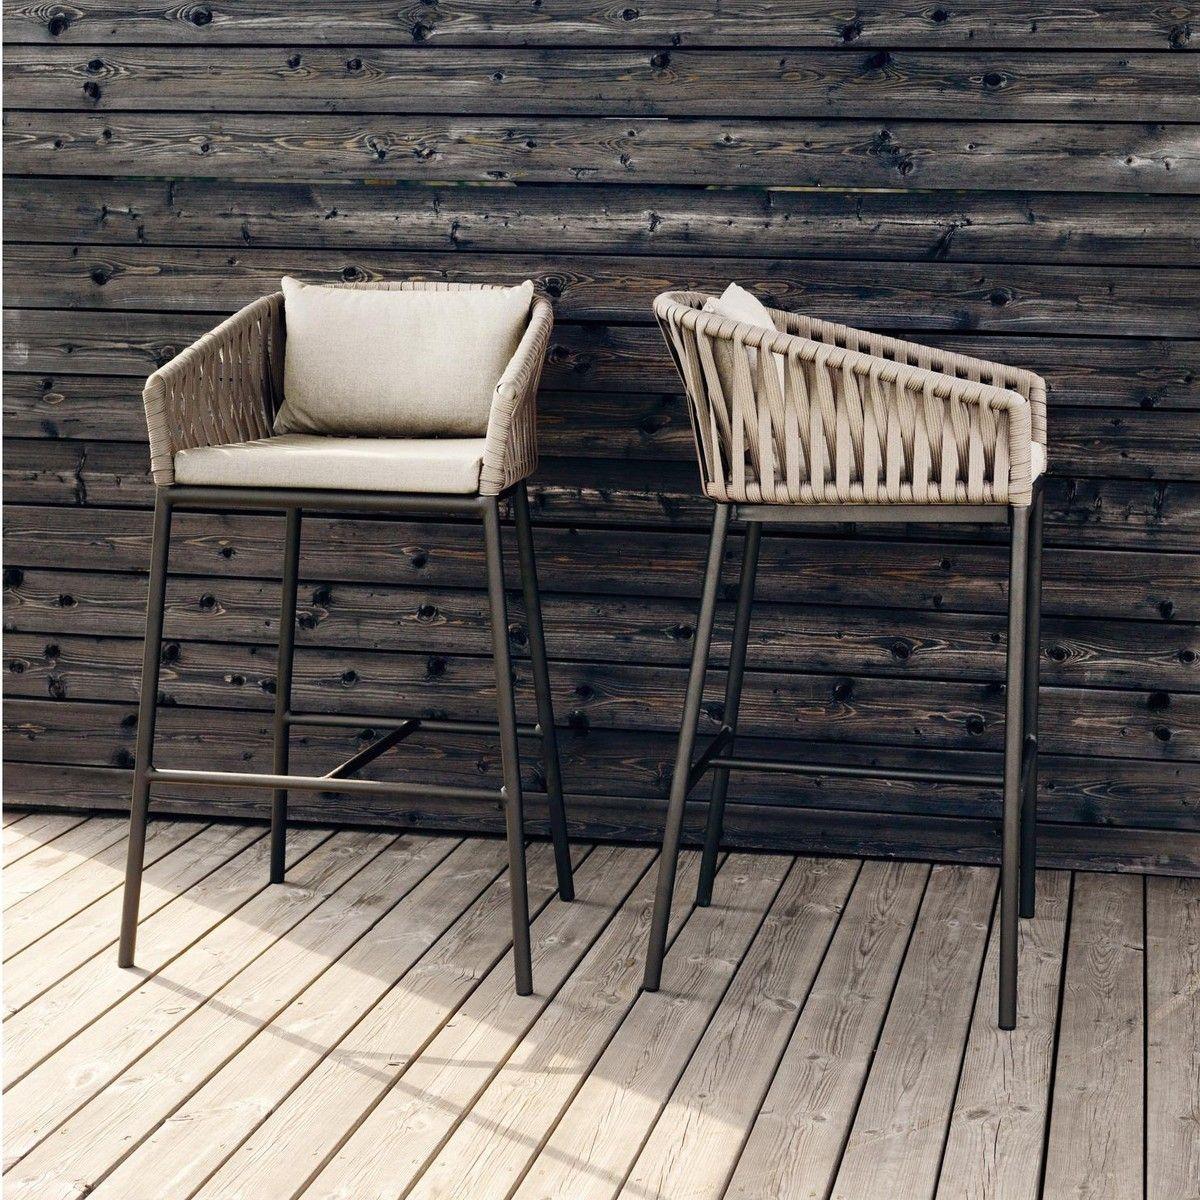 Bitta barstool outdoor furniture decor muebles bar for Kettal muebles